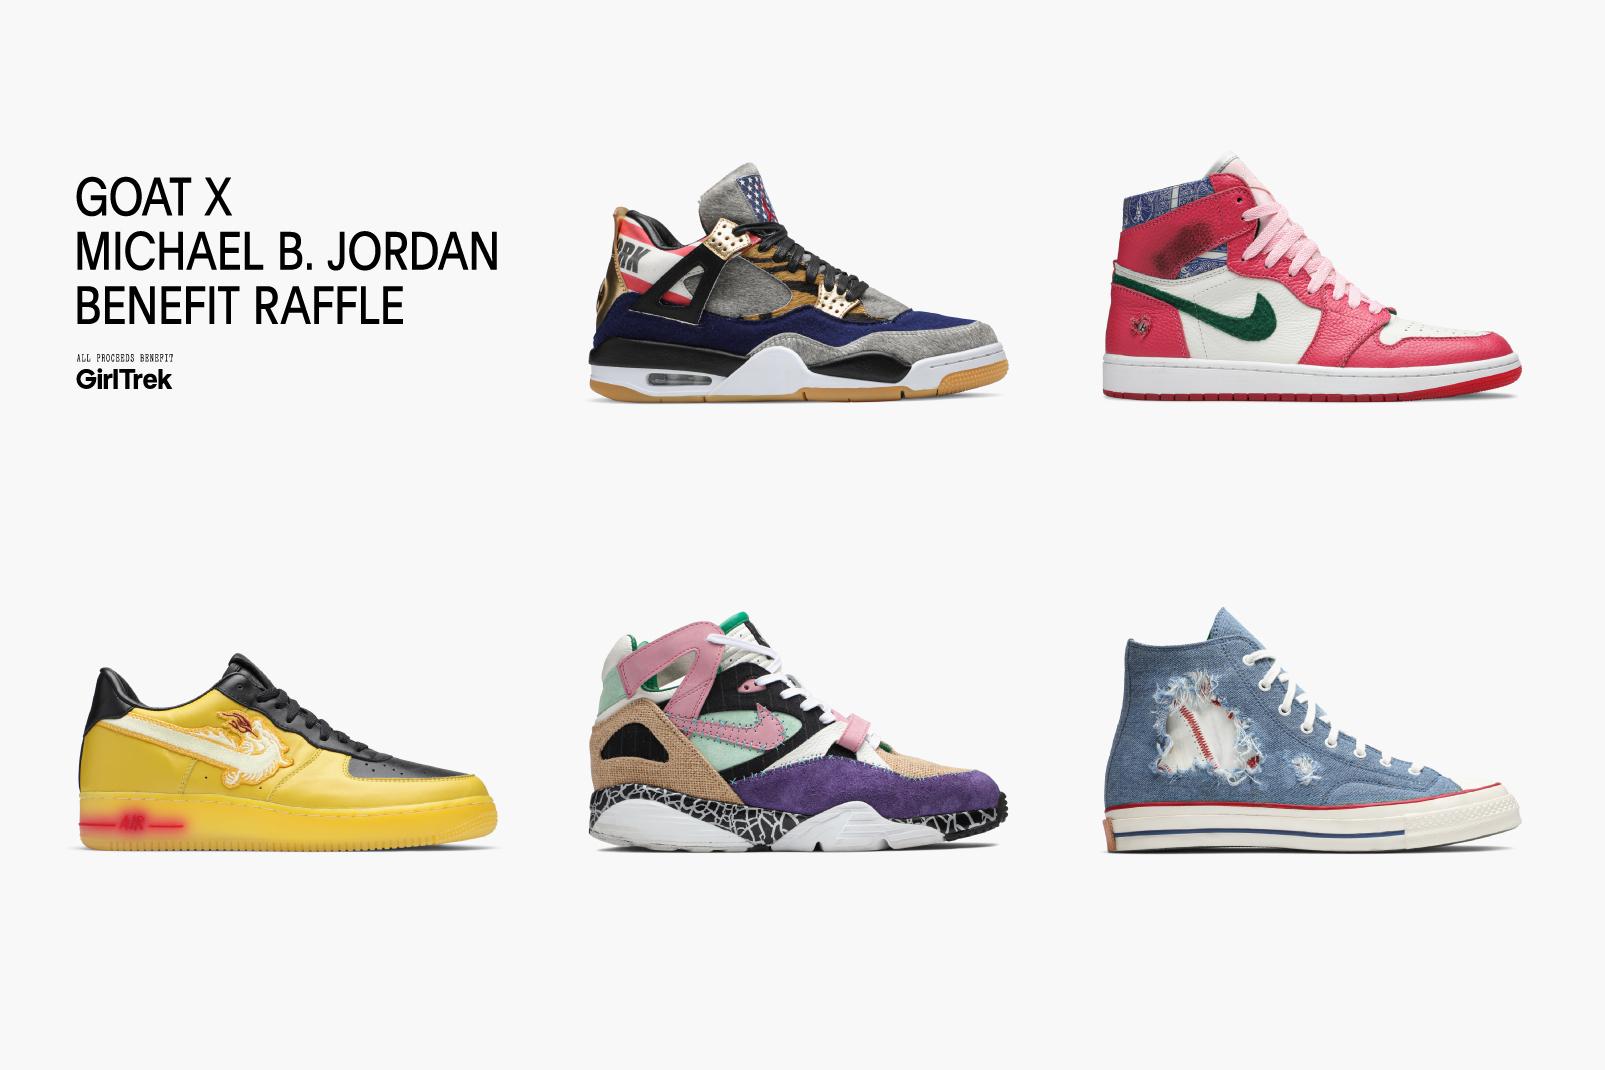 Micahel B. Jordan & The Shoe Surgeon Drop Exclusive Kicks For GOAT Raffle